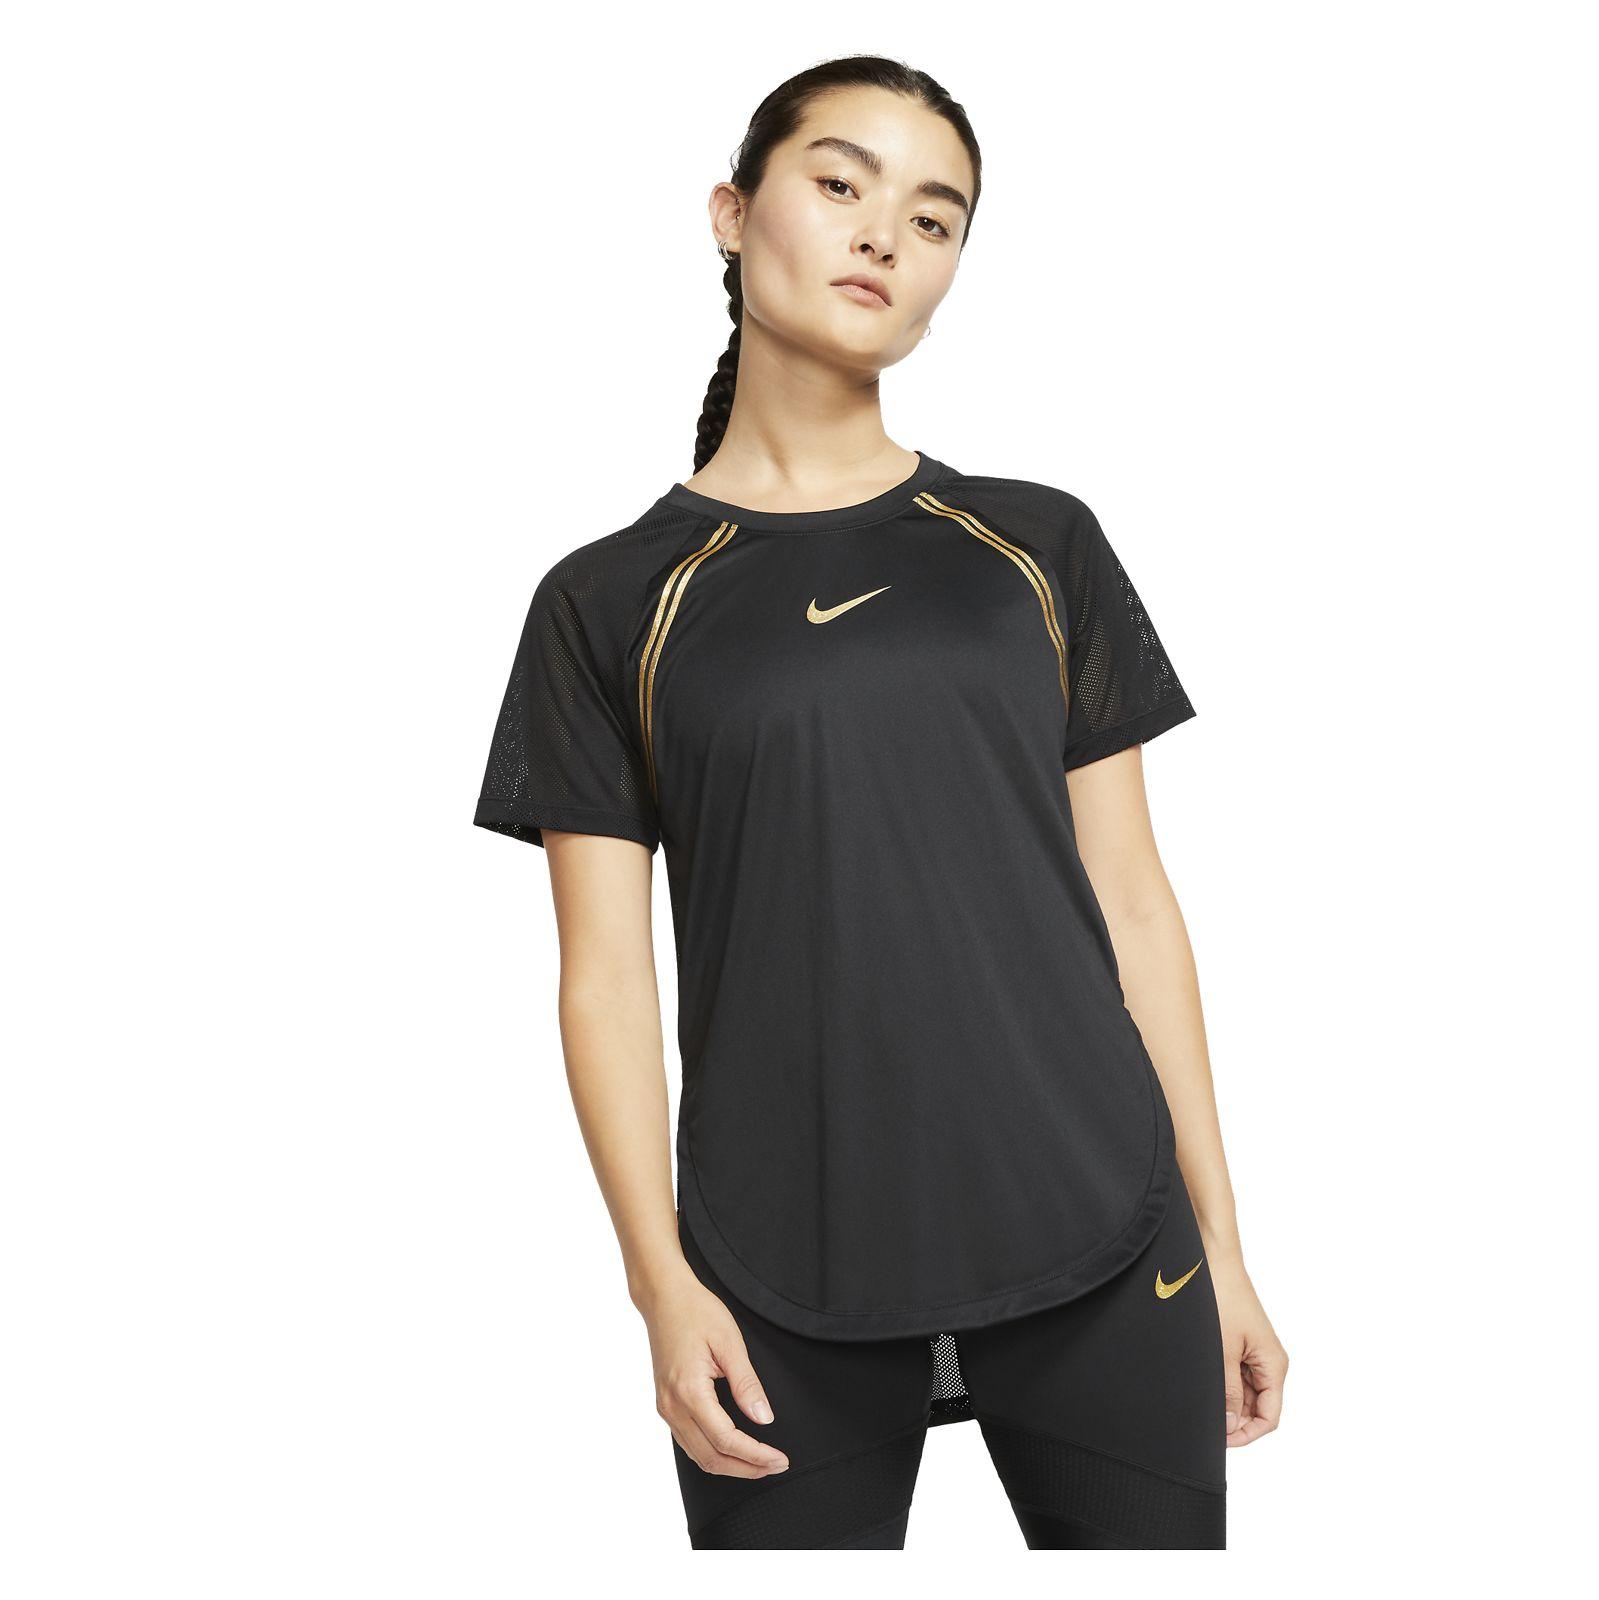 Koszulka damska do biegania Nike Glam Dunk BV3815